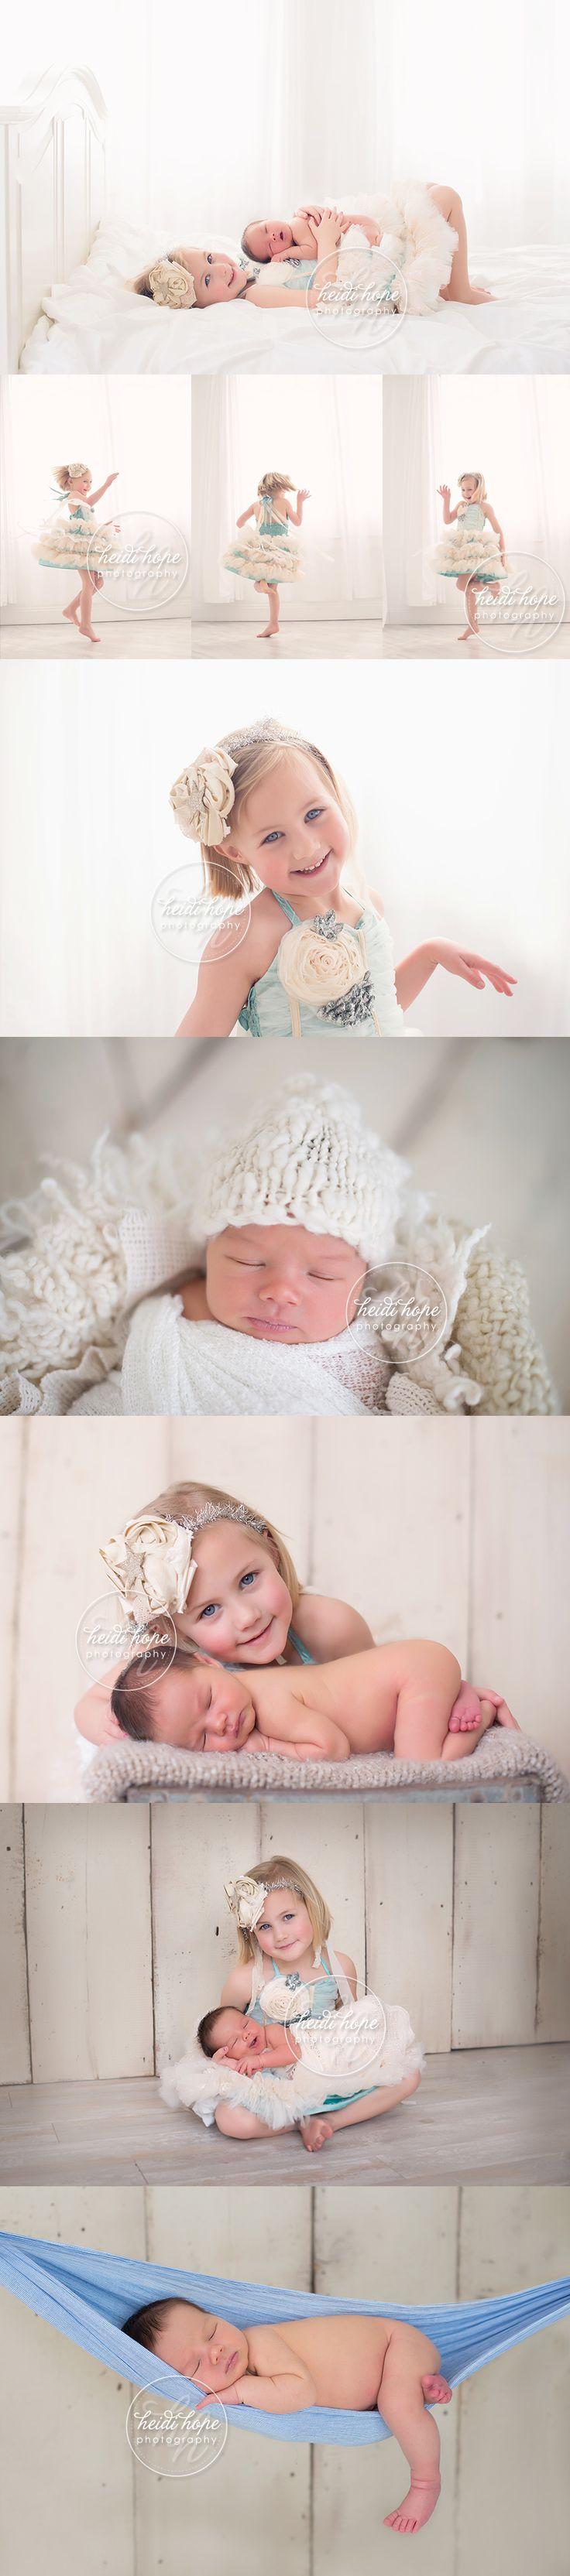 #Newborn baby B and his big sister. #sibling #classicsiblingsession